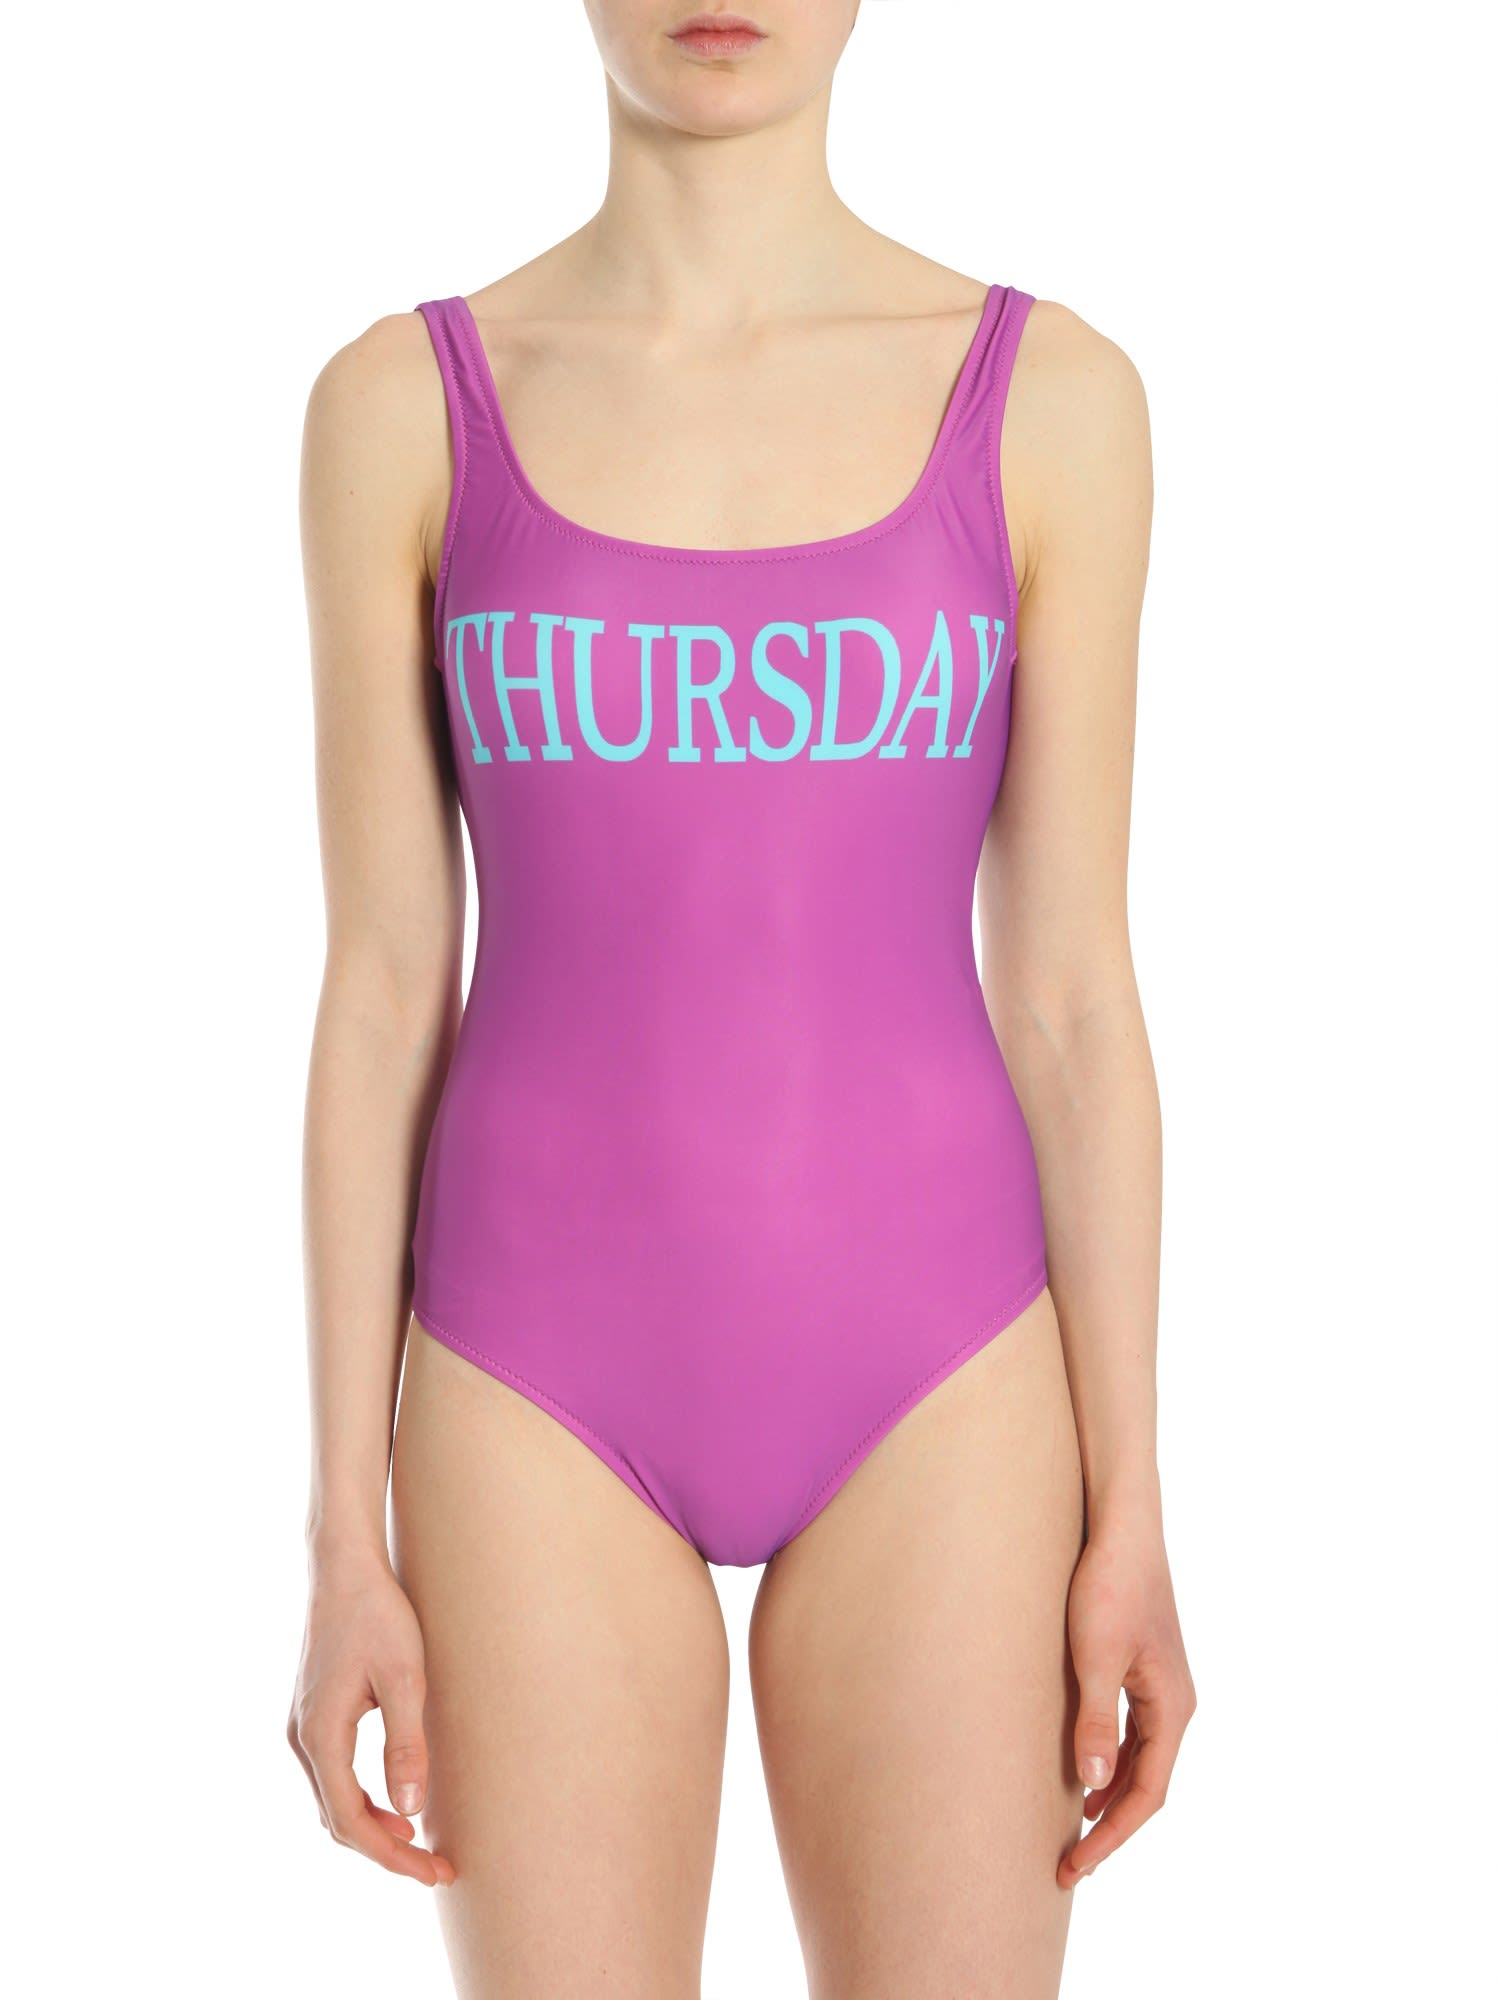 Alberta Ferretti One Piece Swimsuit